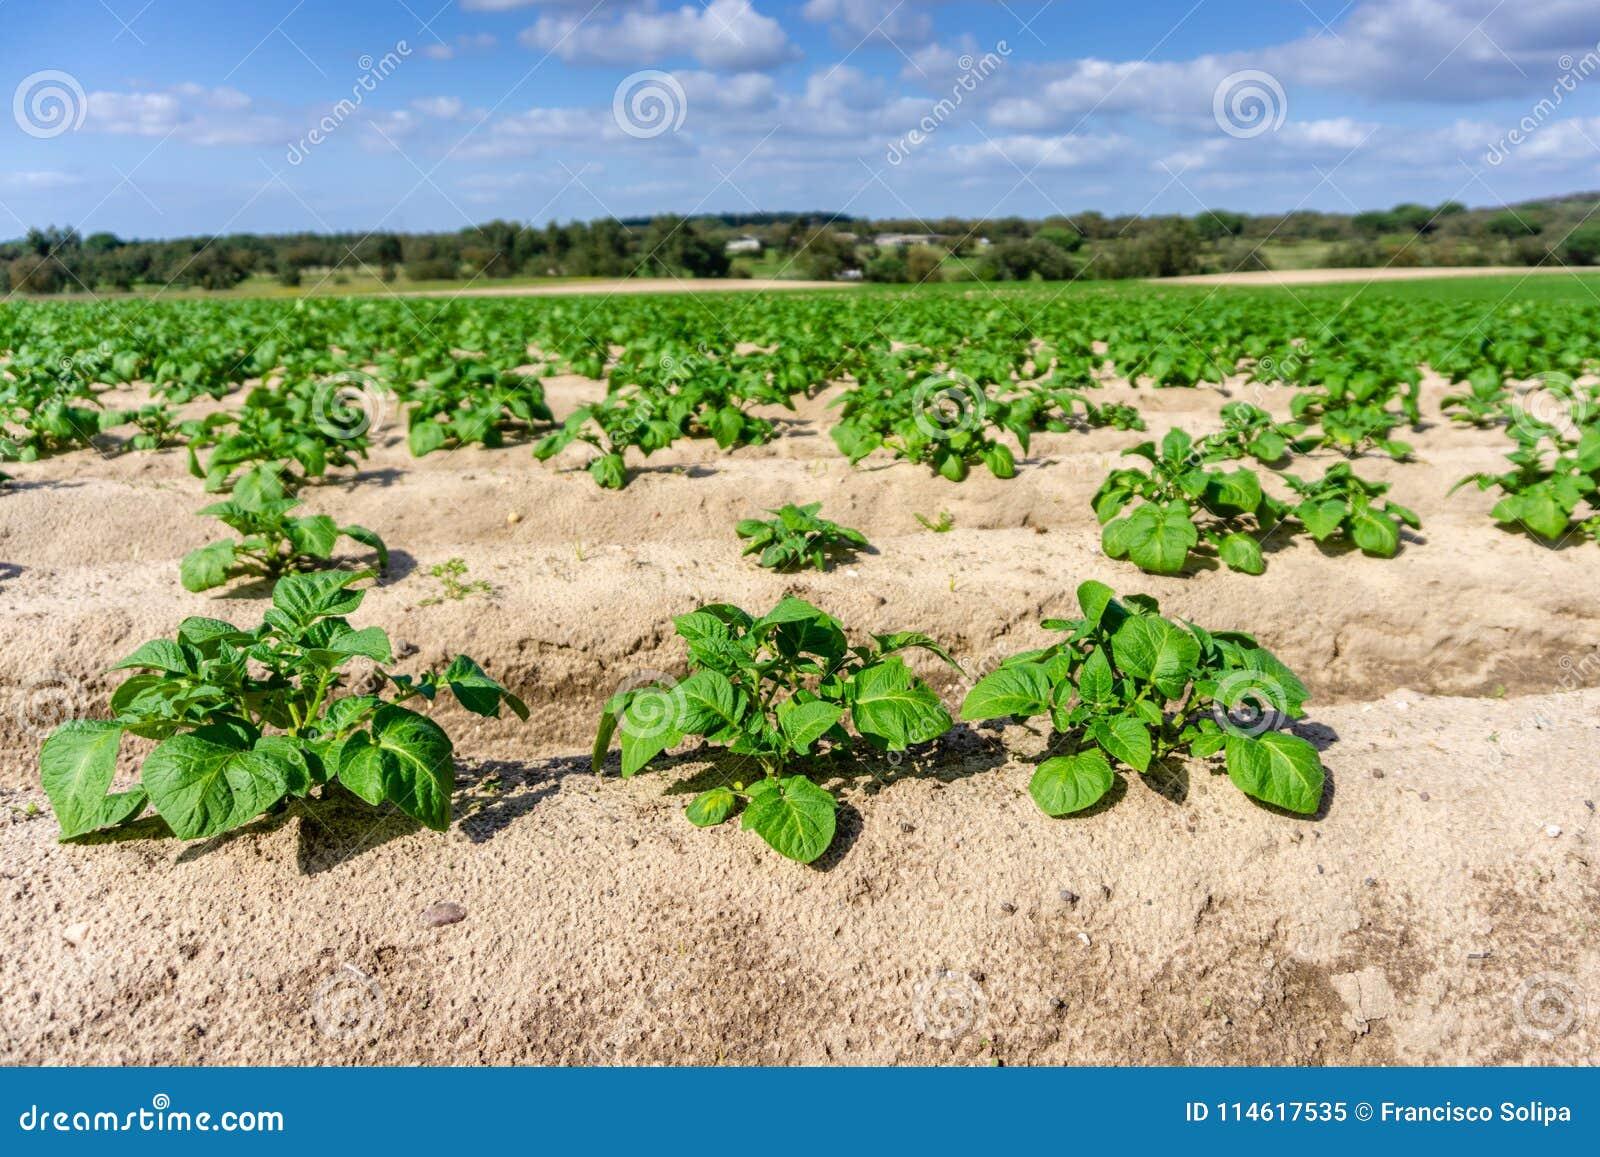 Vegetable garden potato plantations on the ground, concept eco